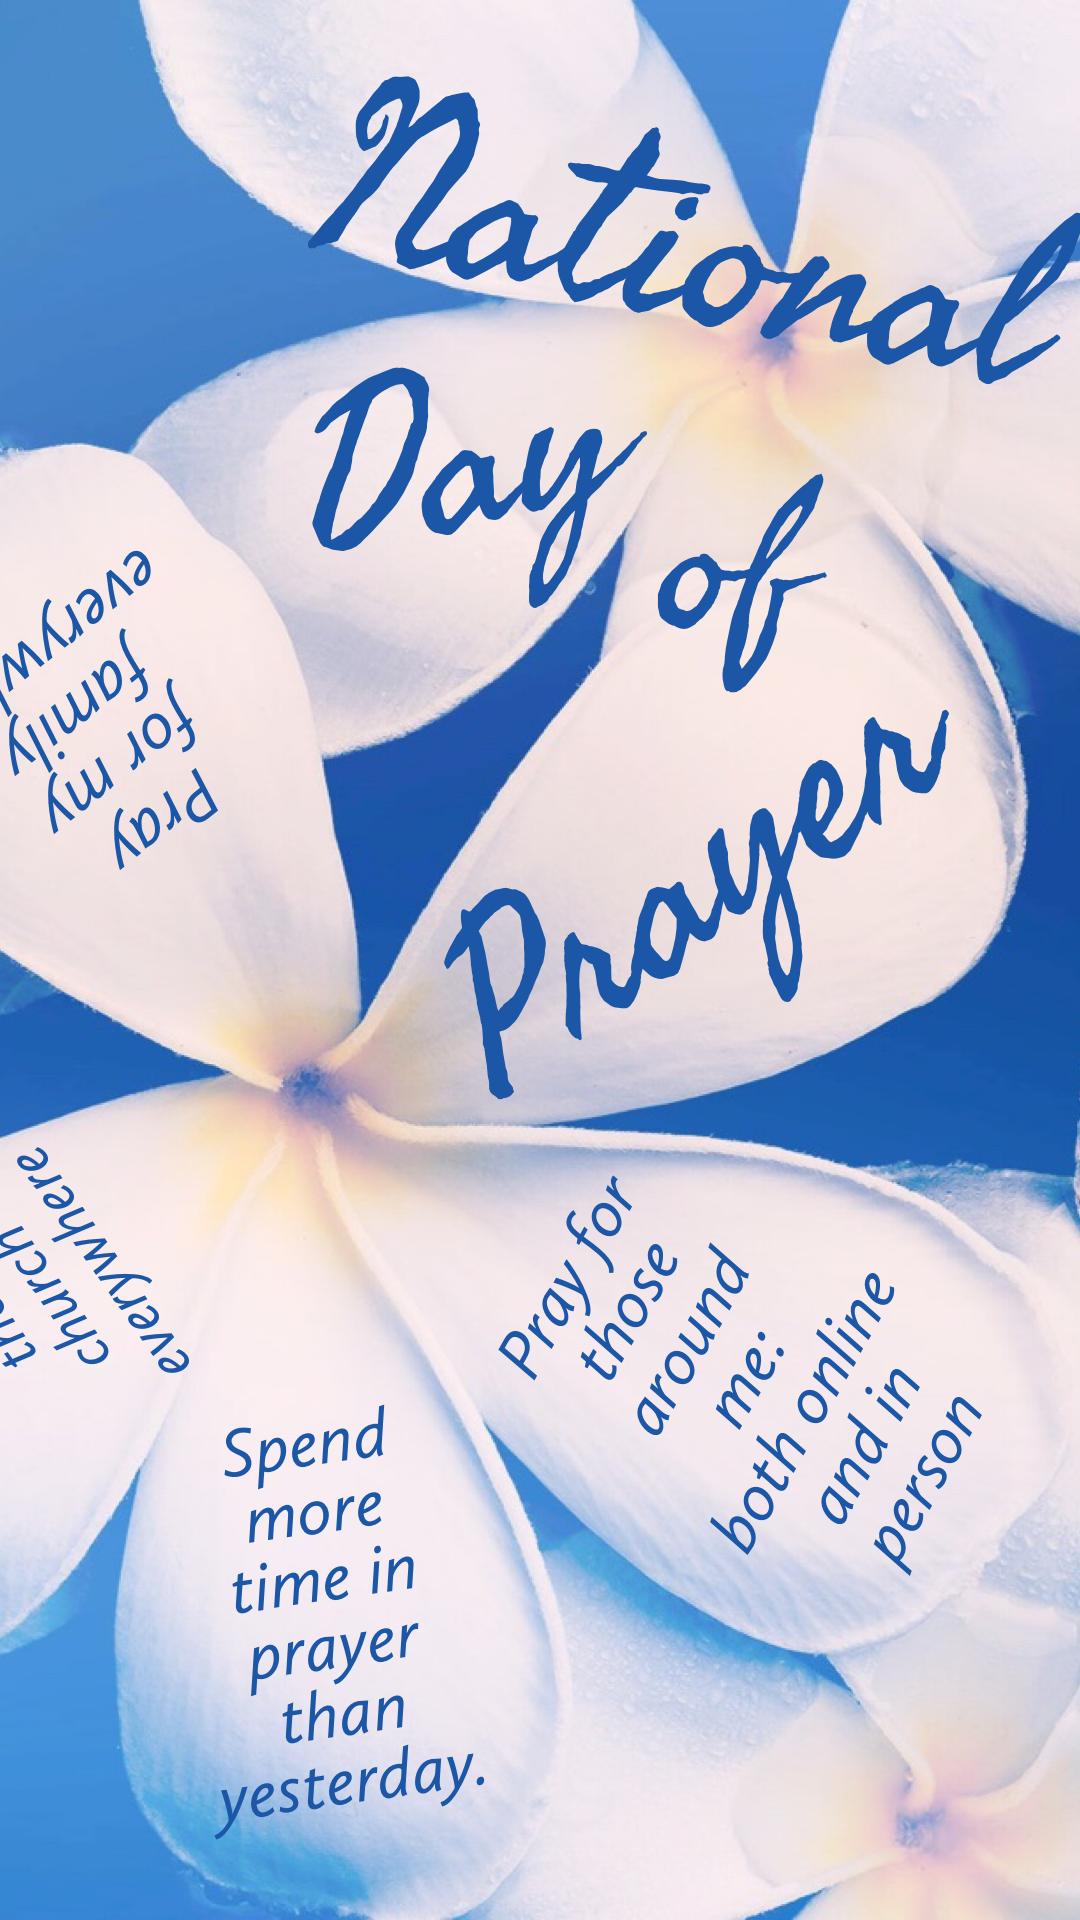 National Day Of Prayer Inspirational Inspirationalquotes Motivation Bibleverses Love Praisegod Bible Quotes Prayer Encouraging Scripture Christian Blogs